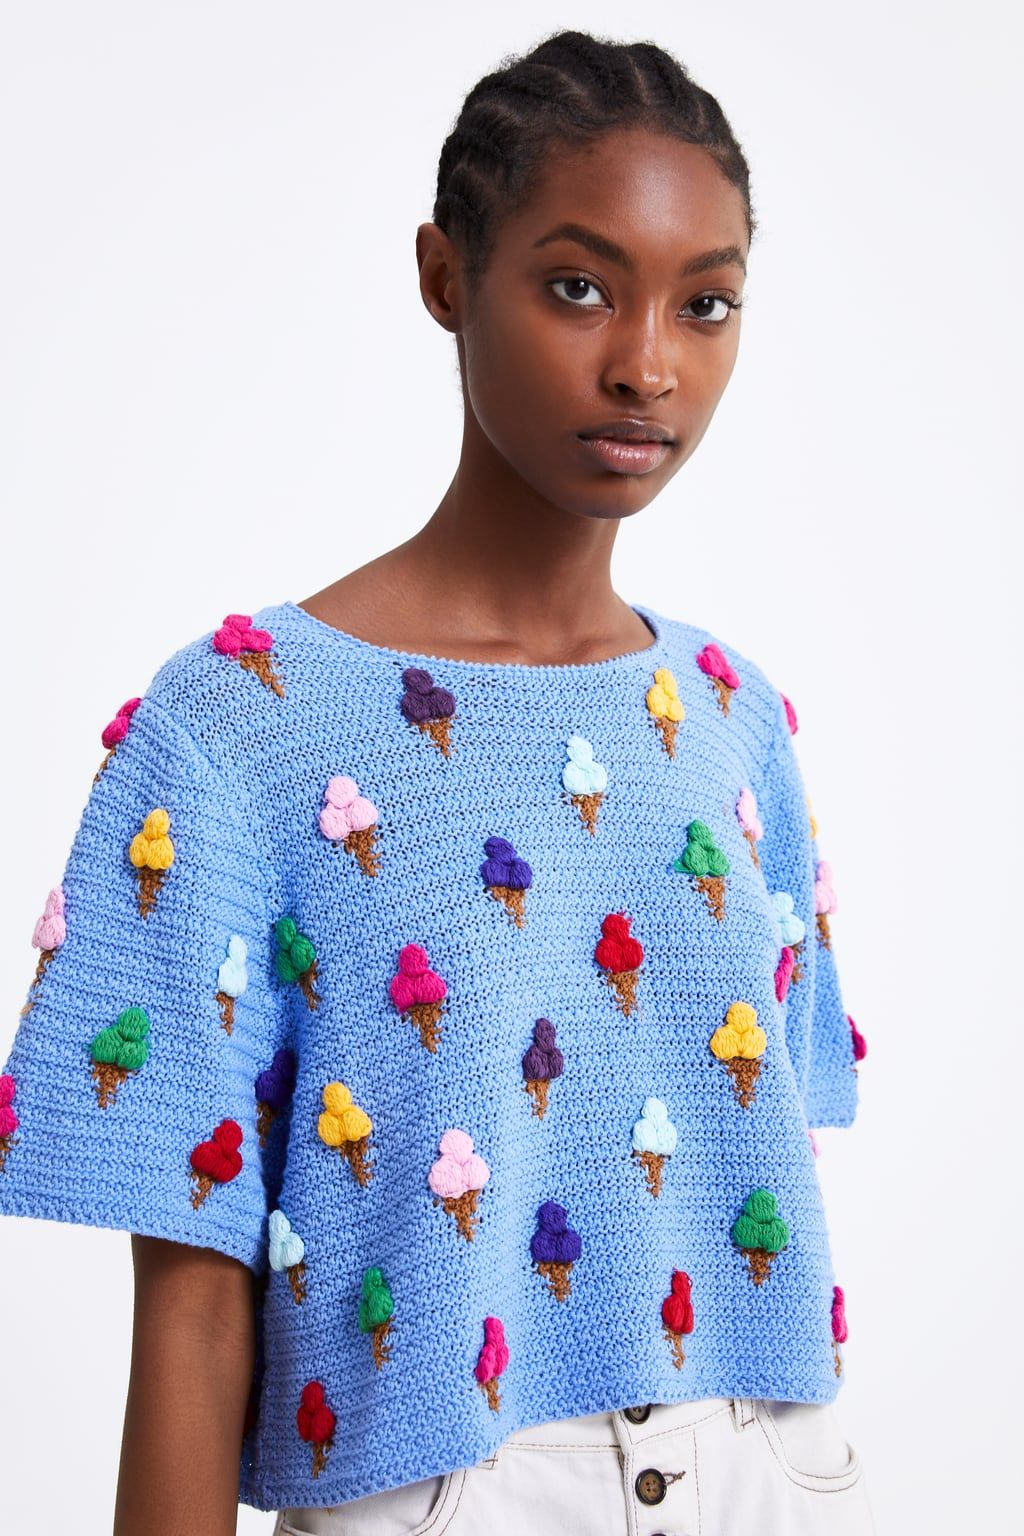 a3e01ae281 Textured ice cream sweater | I ♥ Gifts (Wish List) | Crochet ...